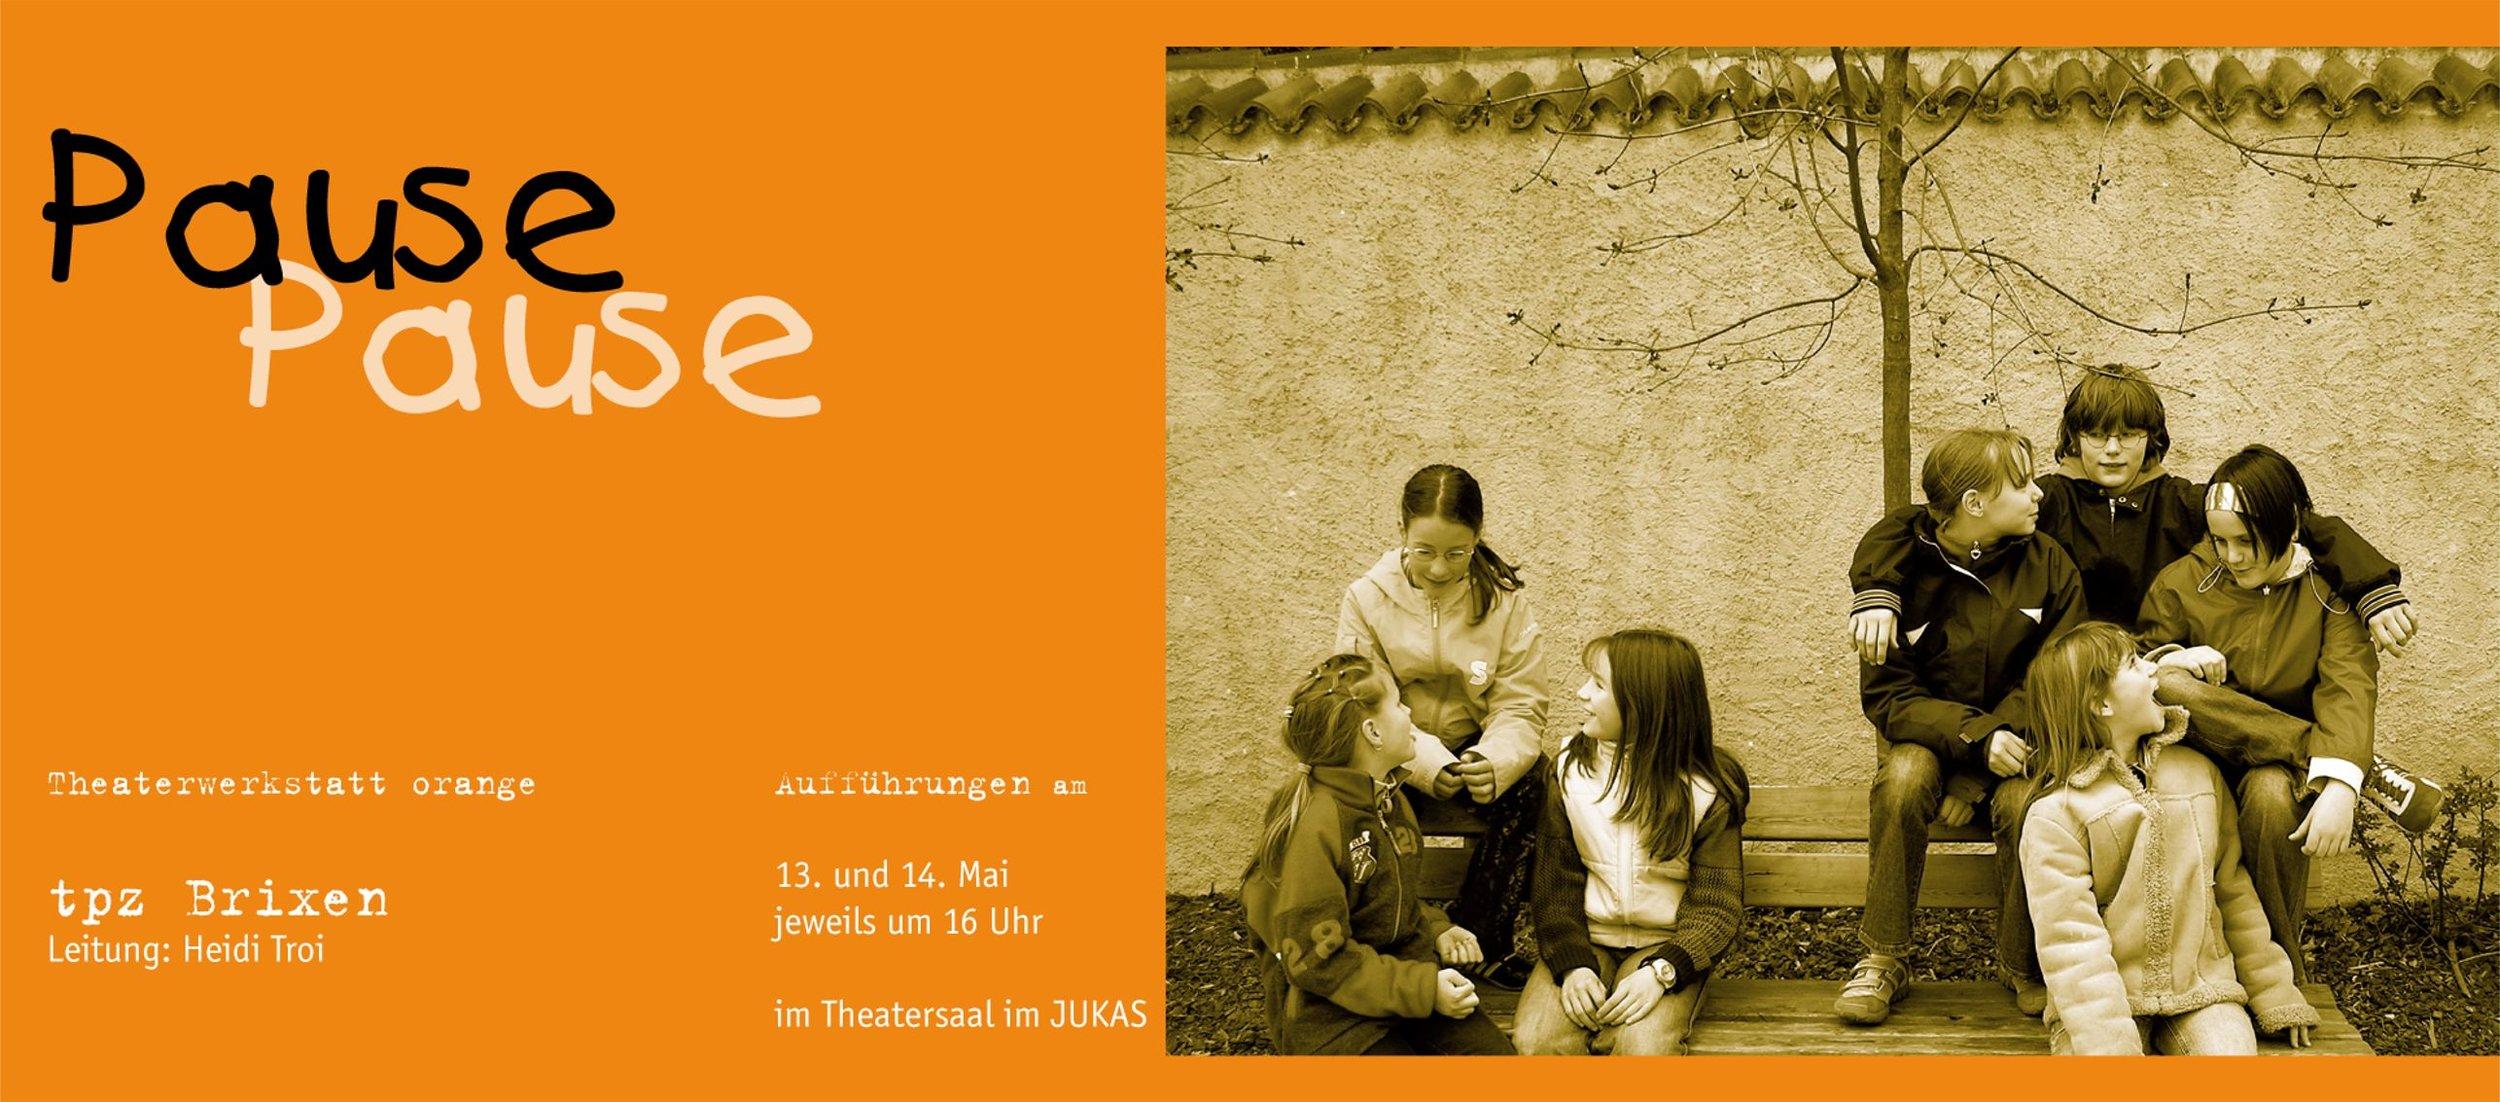 2005 orange Pause Pause plakat.jpg